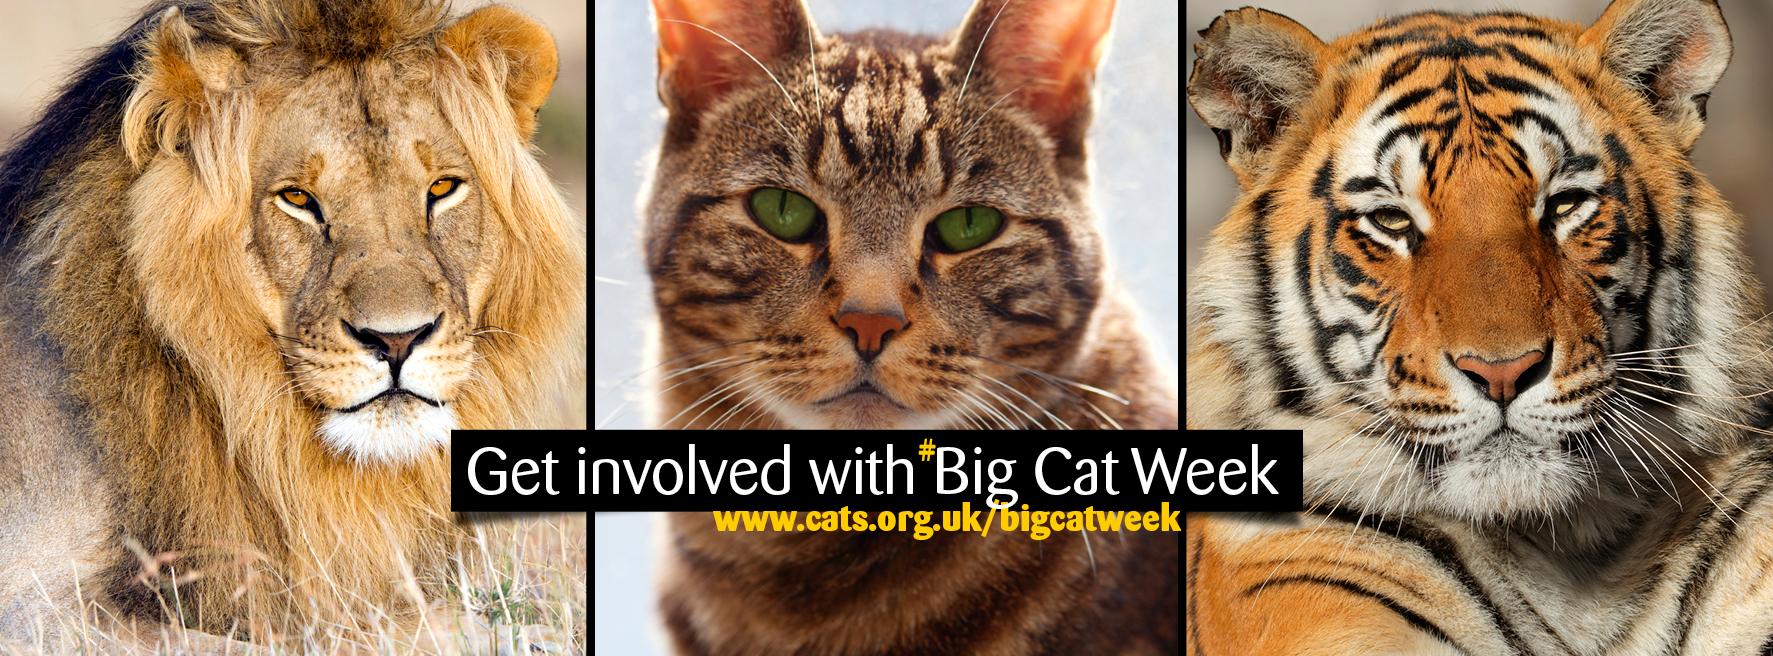 Big Cat Week banner